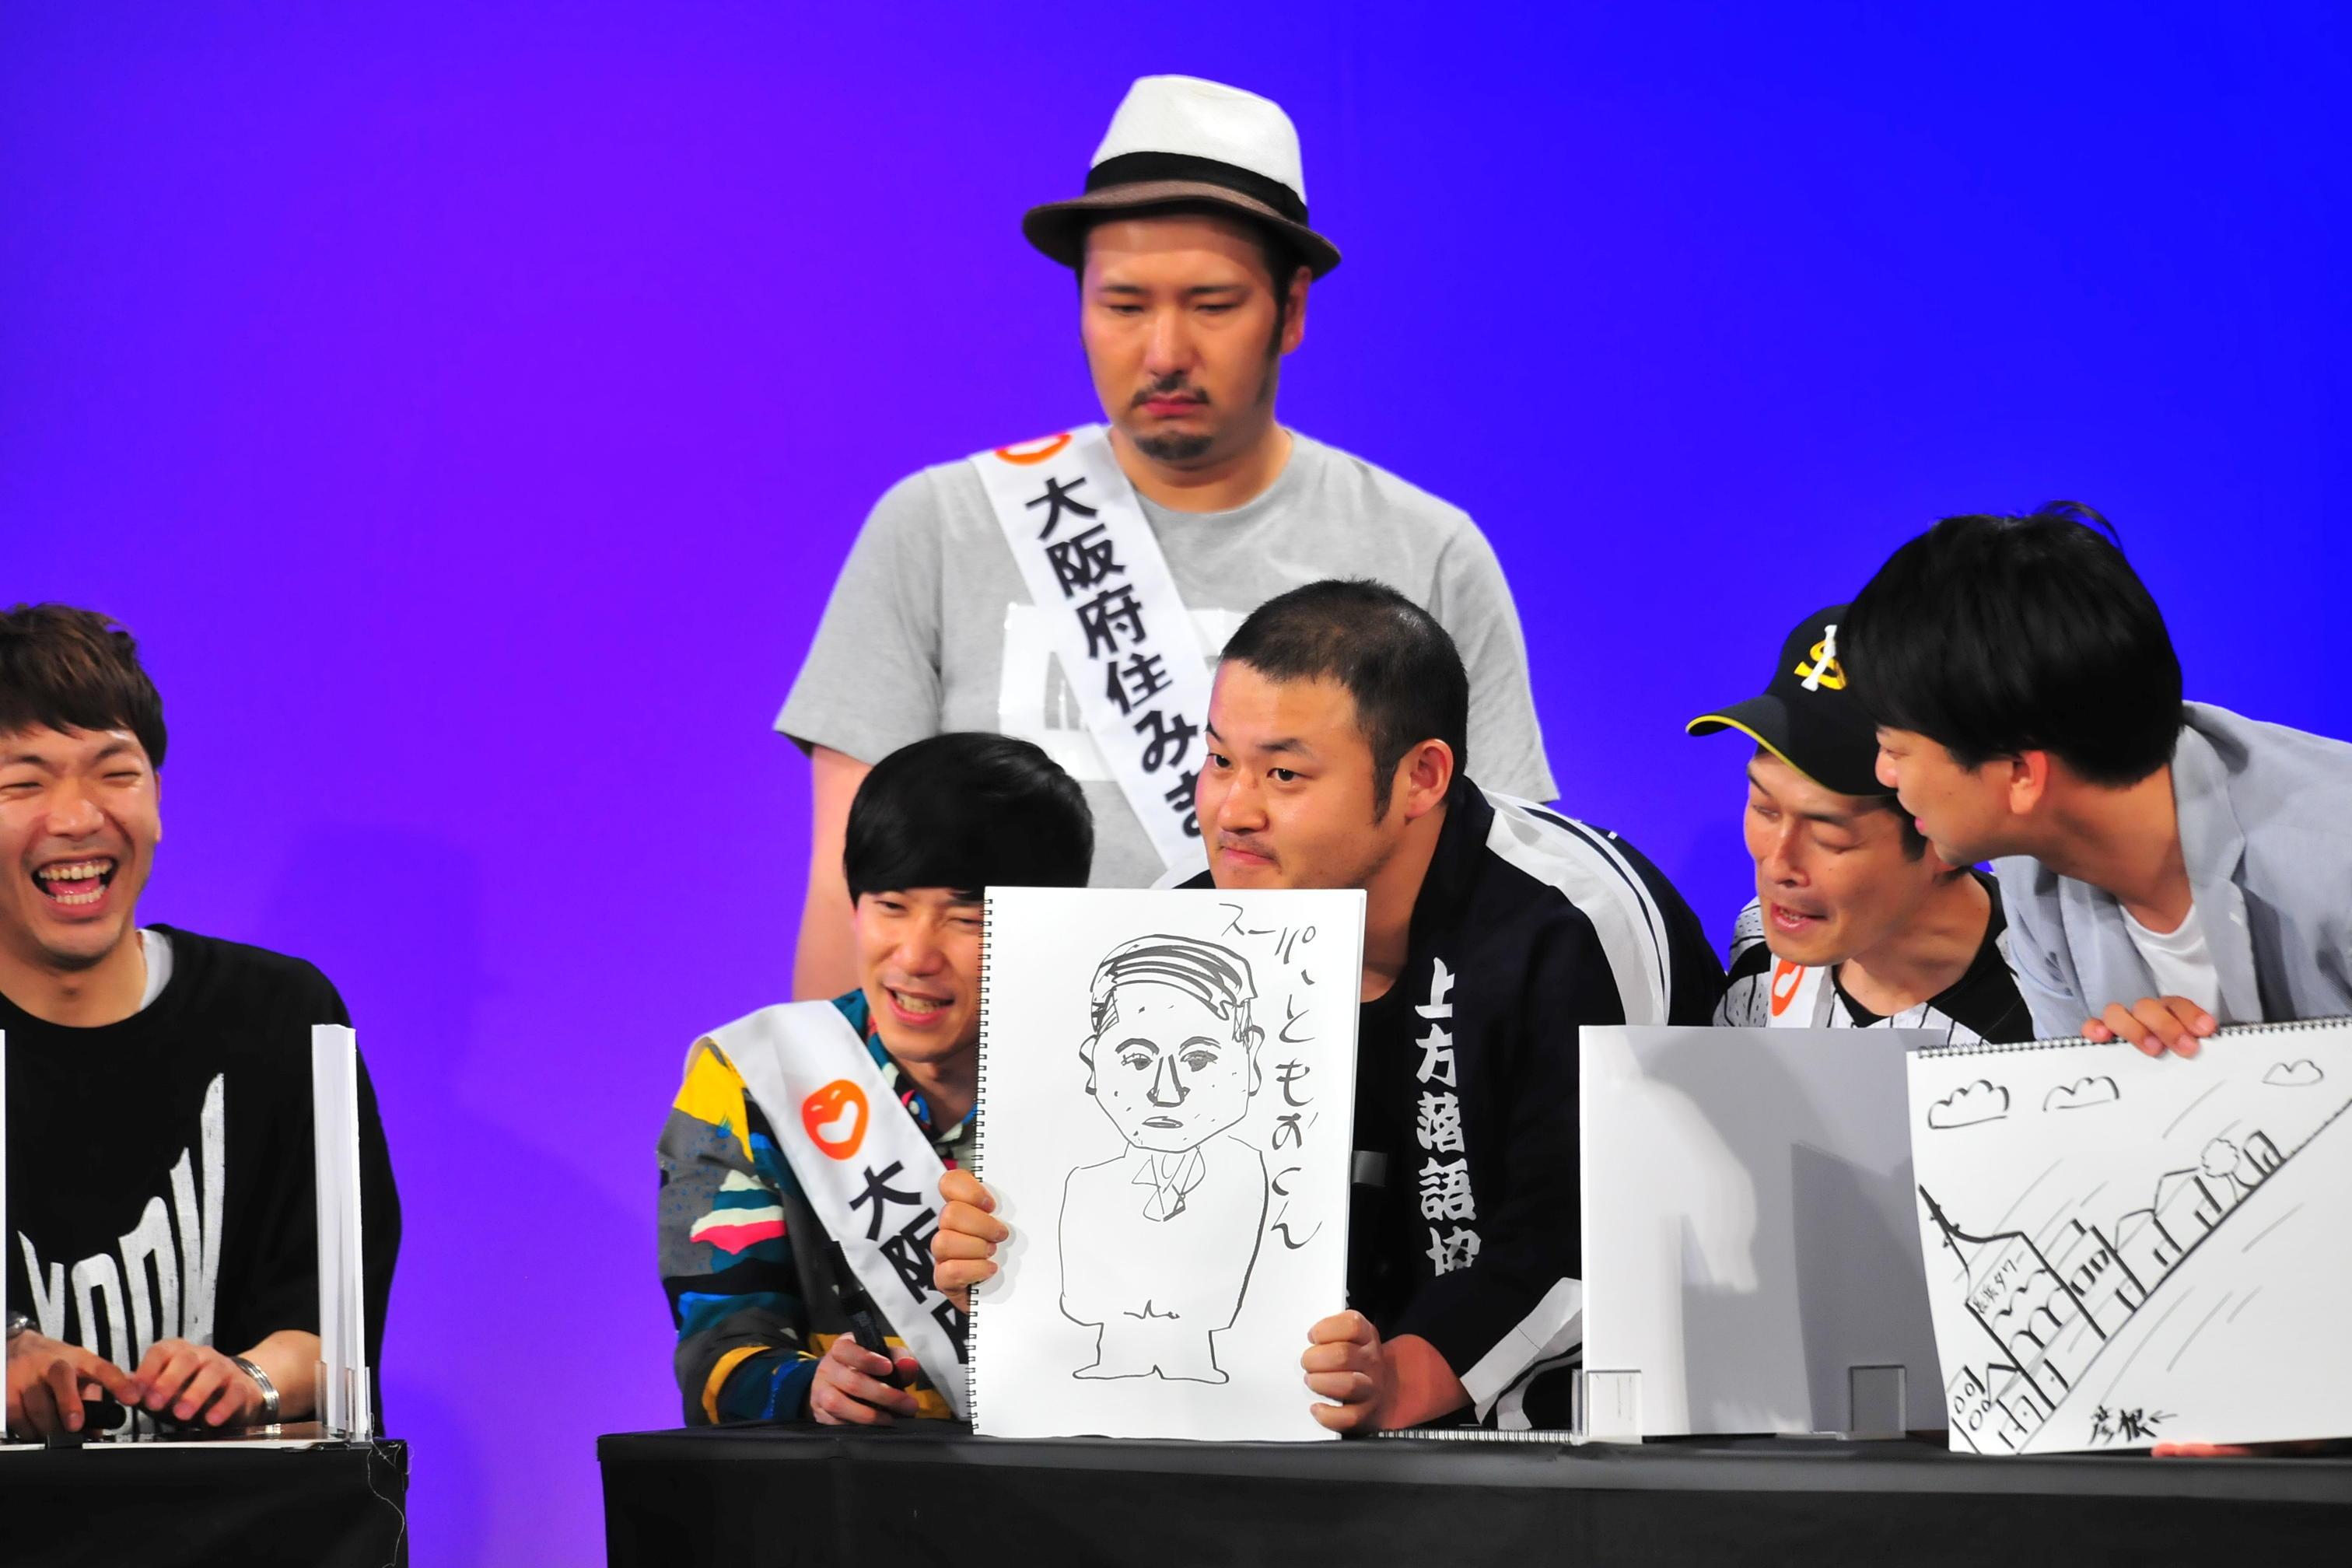 http://news.yoshimoto.co.jp/20160516144425-a002c0e48917112588d0bdd6f7c8e10668608410.jpg